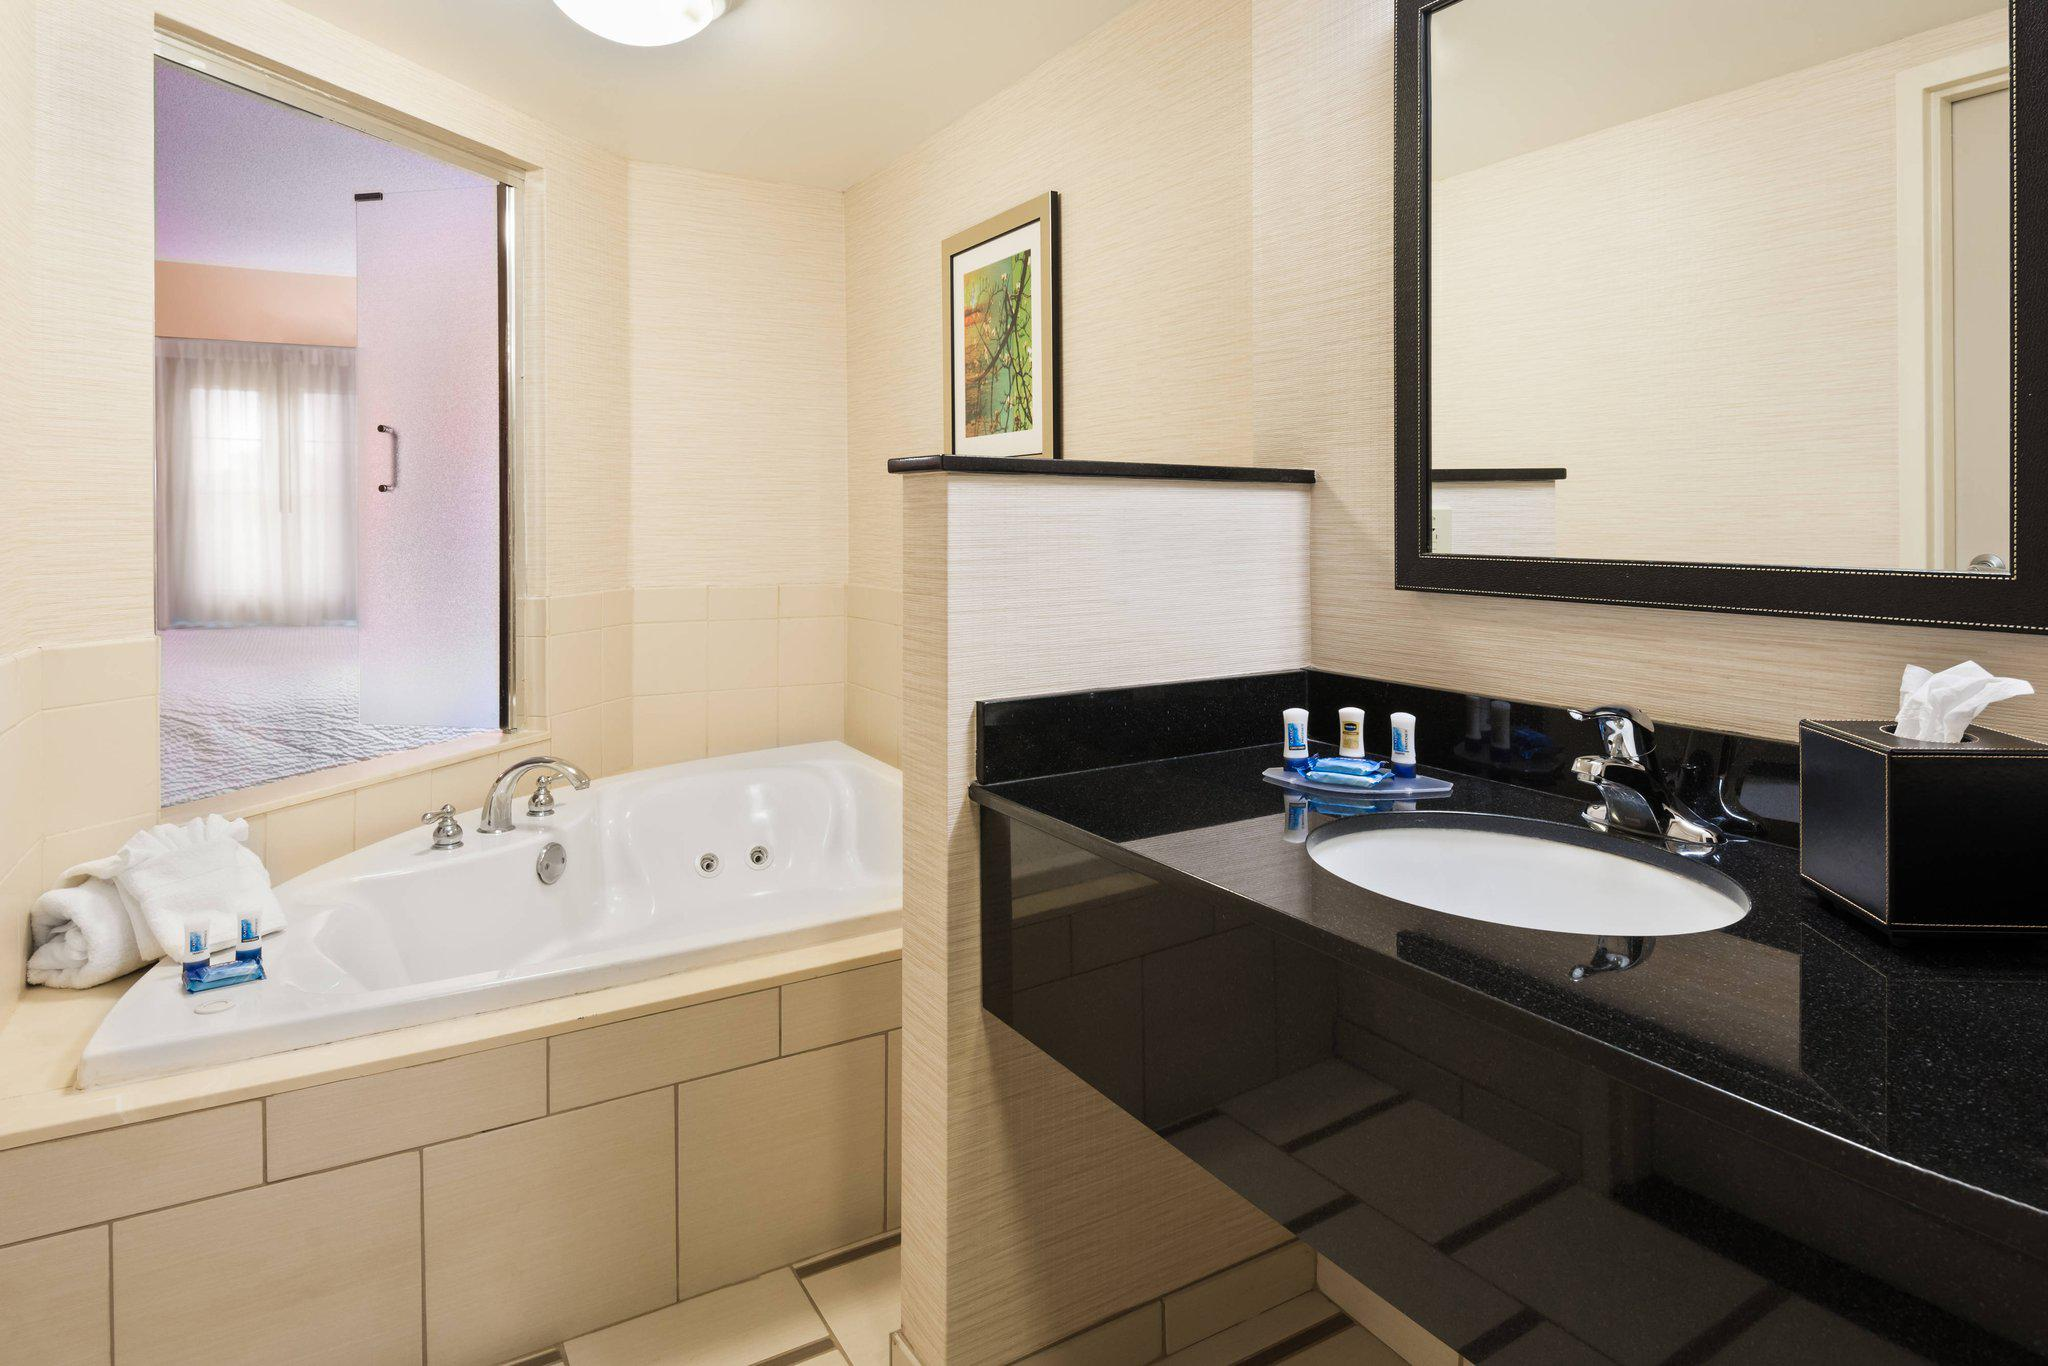 Fairfield Inn & Suites by Marriott Clearwater in Clearwater, FL, photo #19